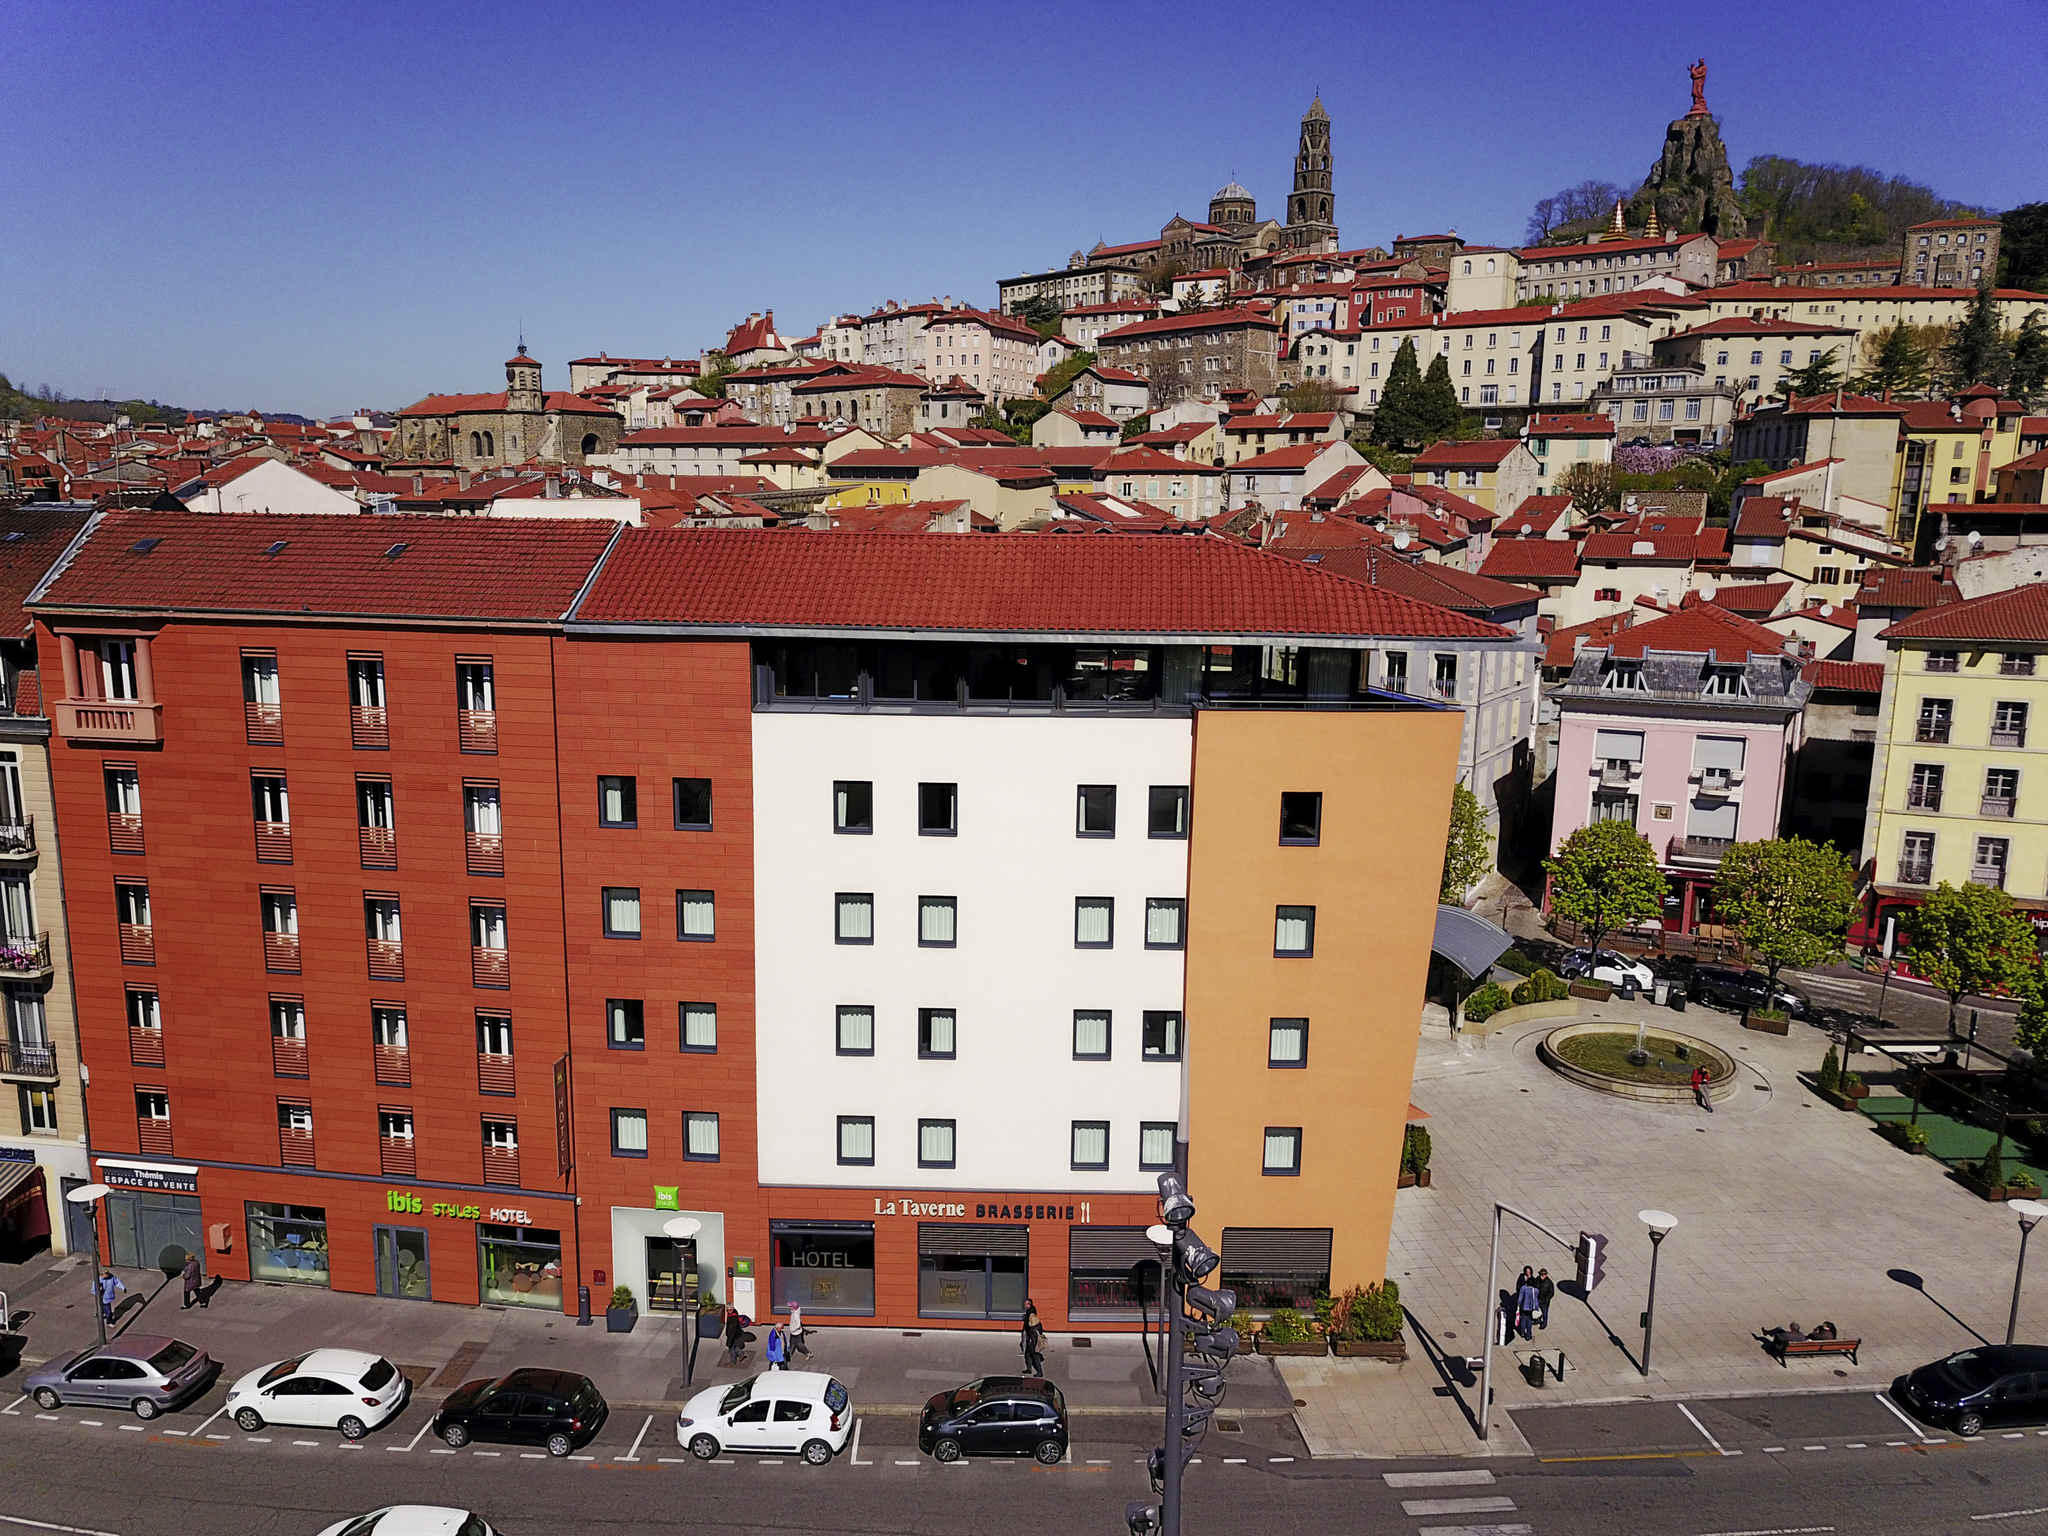 Hotell – ibis Styles Le Puy-en-Velay